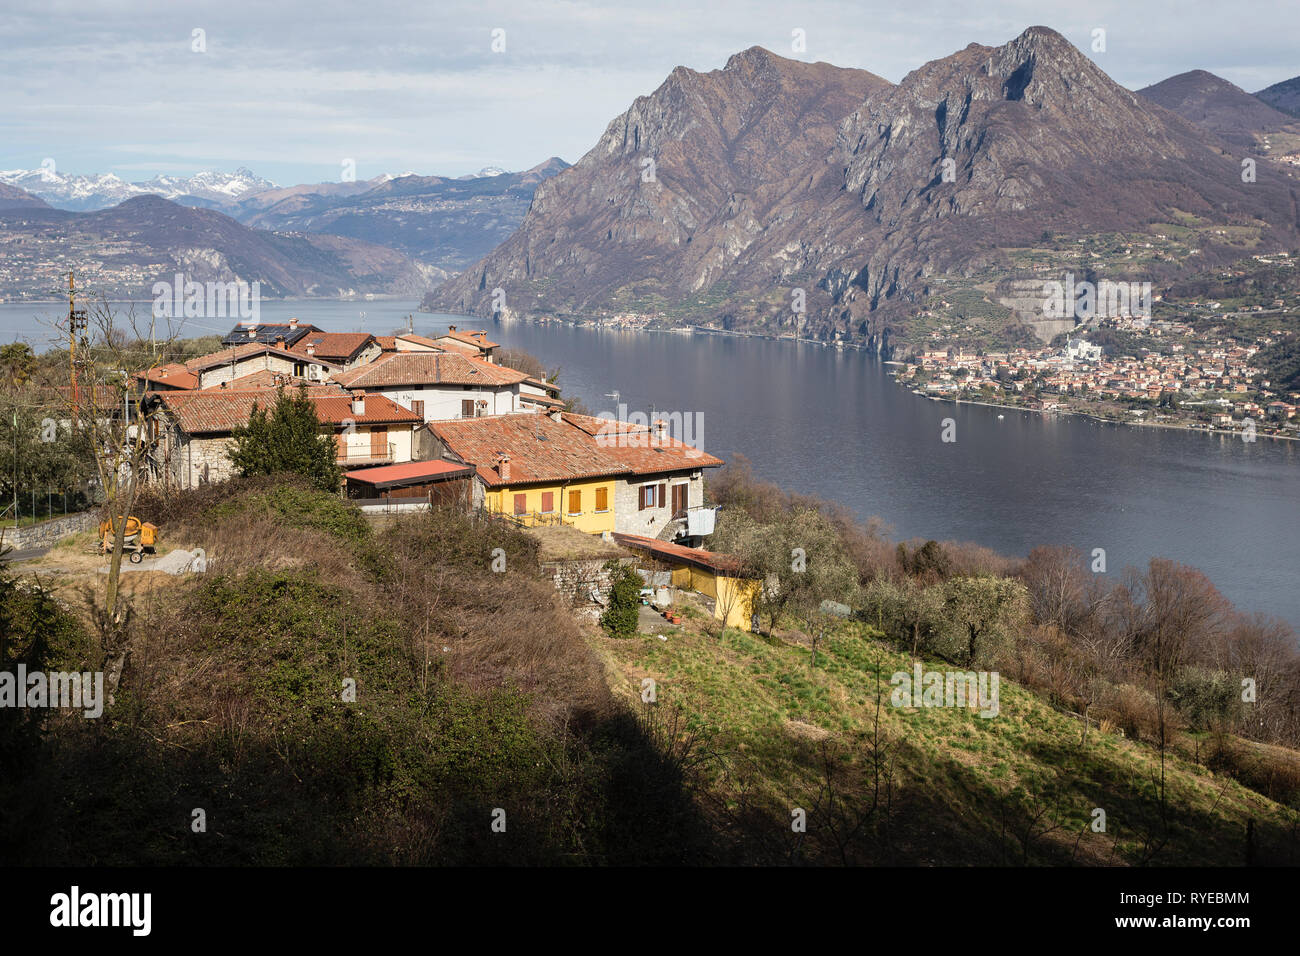 Village of Olzano on Monte Isola, Lake Iseo, Lombardy, Italy - Stock Image